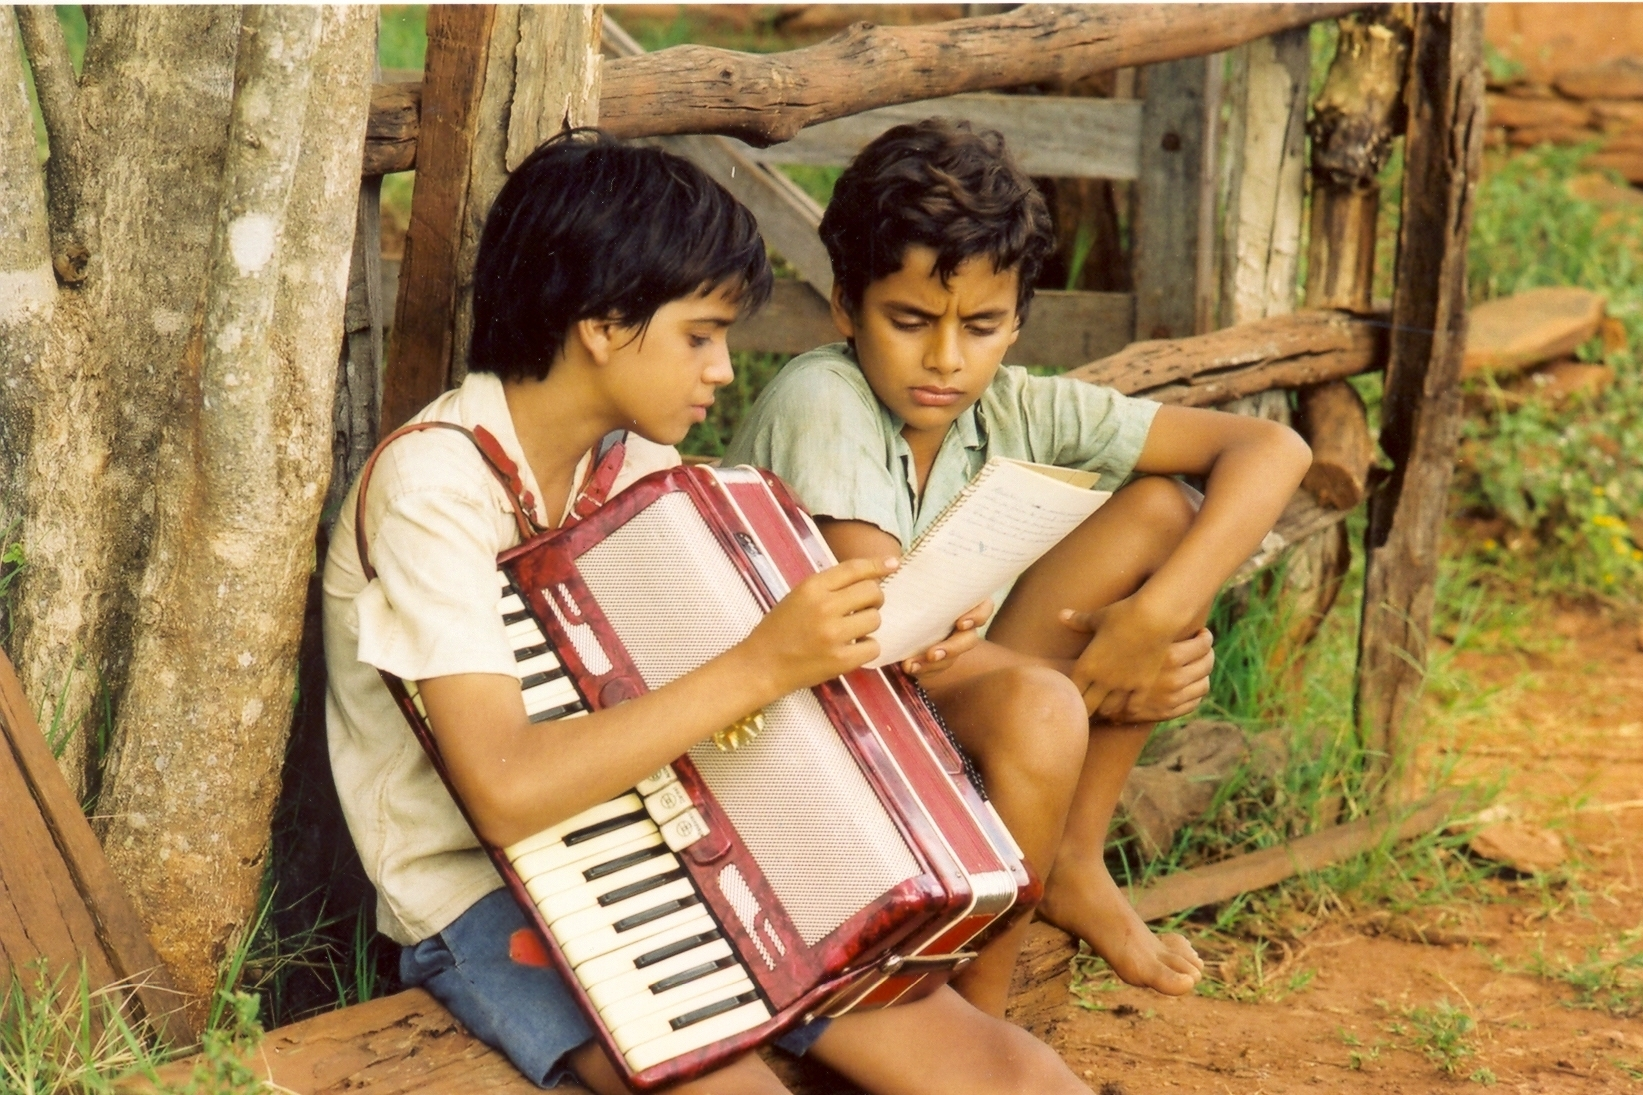 DE BRESSANE A CARLA PEREZ: MUSICAIS BIOGRÁFICOS NO BRASIL